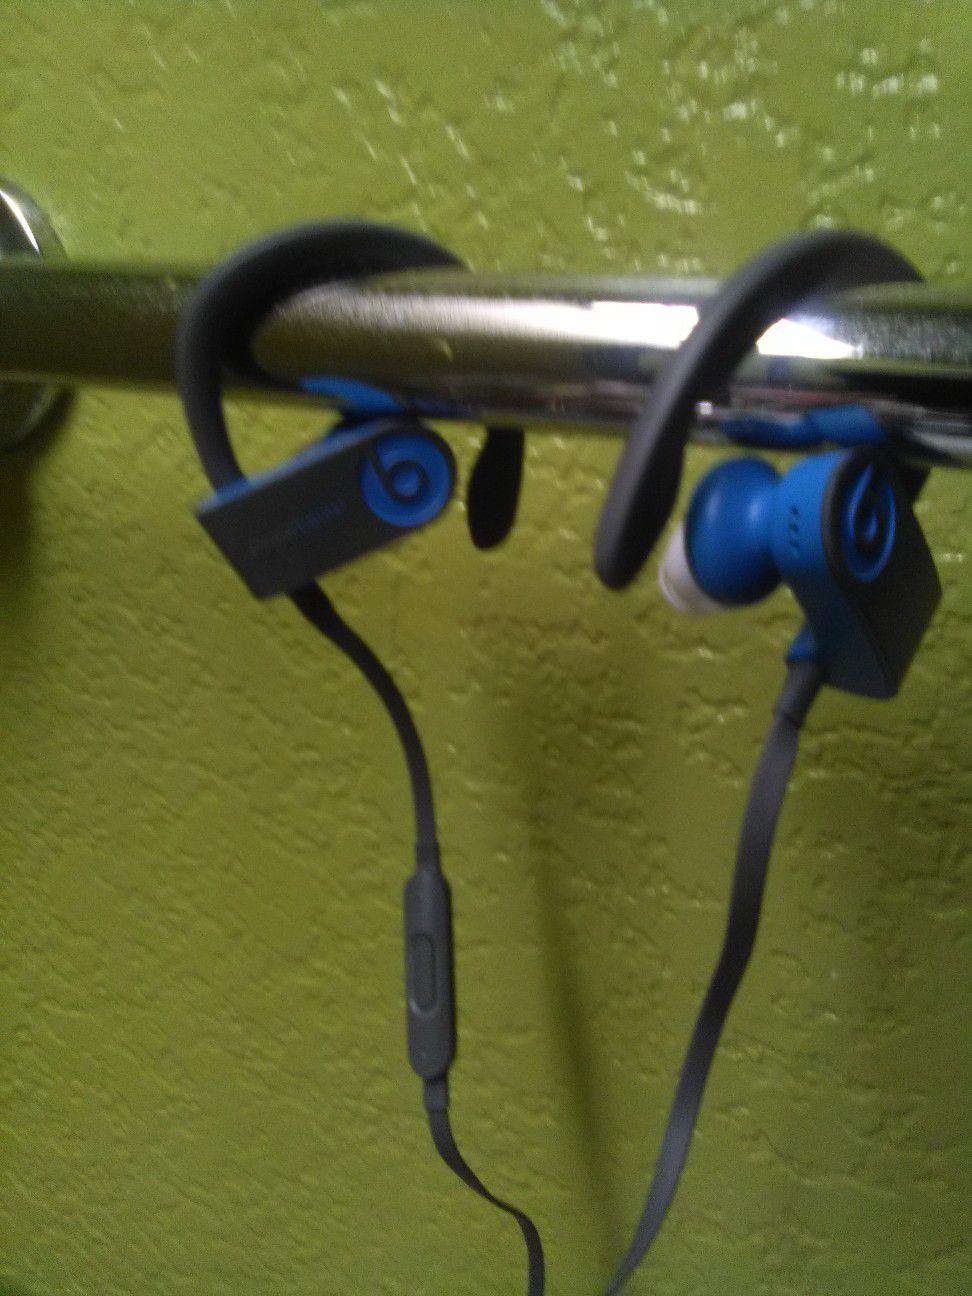 Powerbeats 3 Bluetooth Earbuds